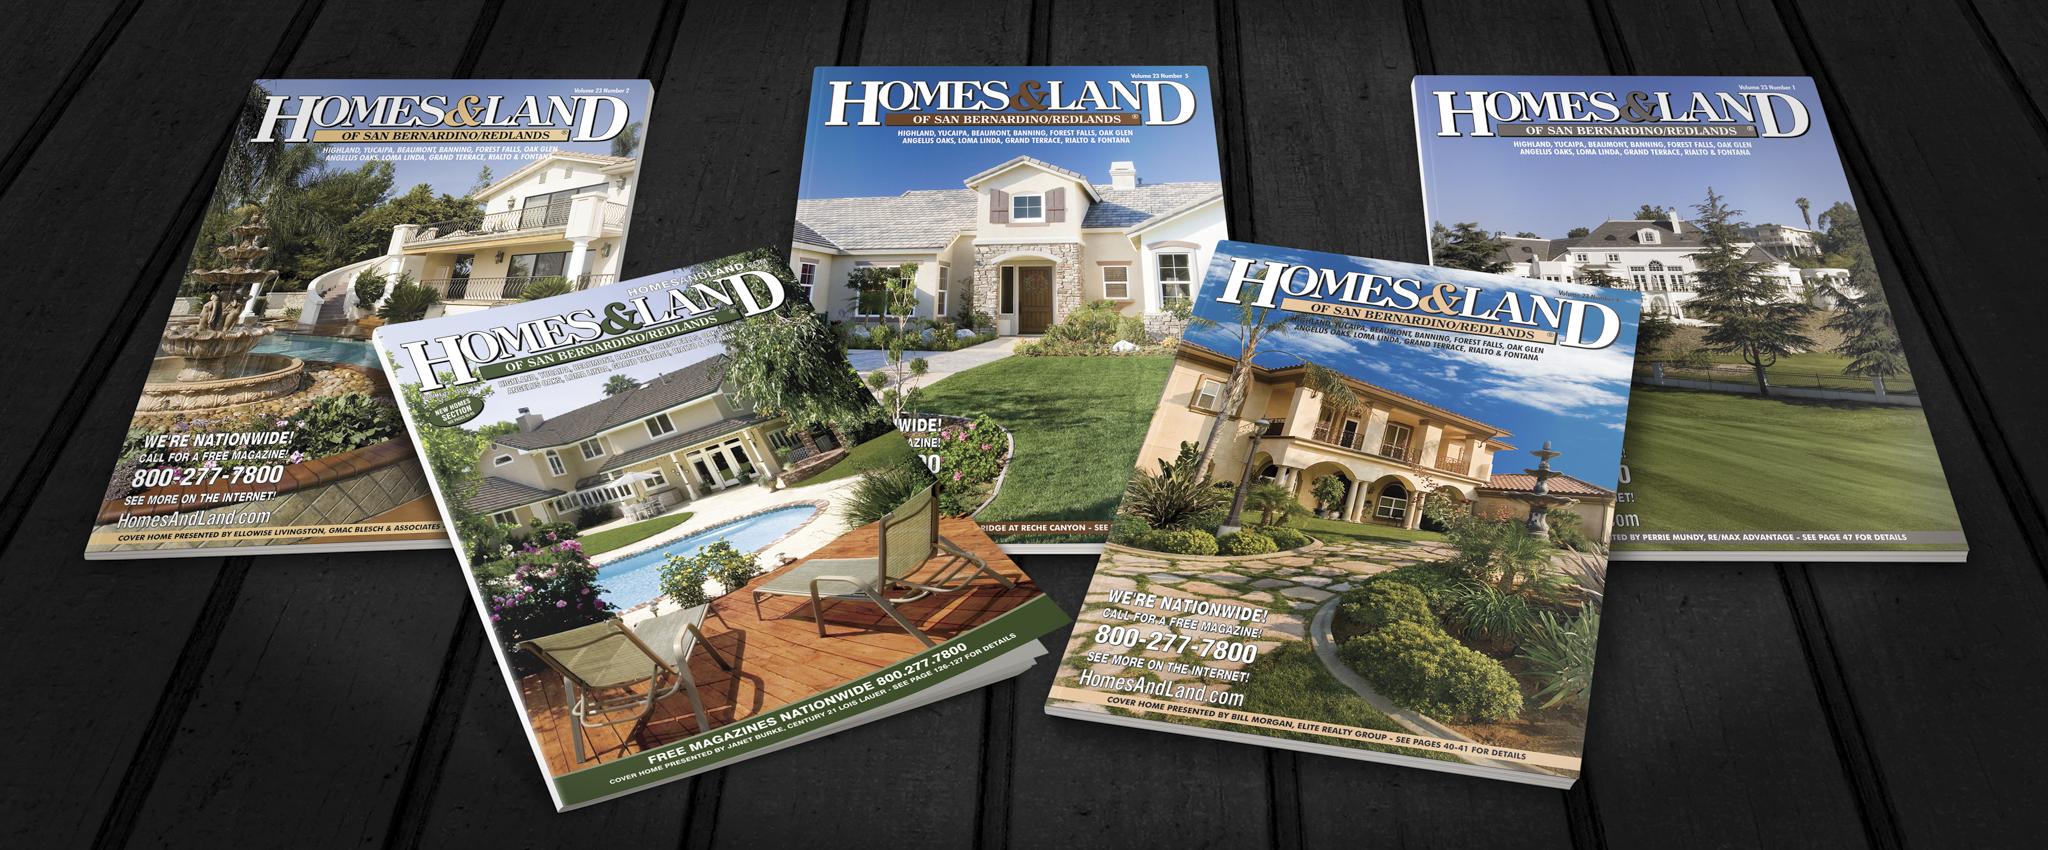 Homes Land Magazine 1212 3